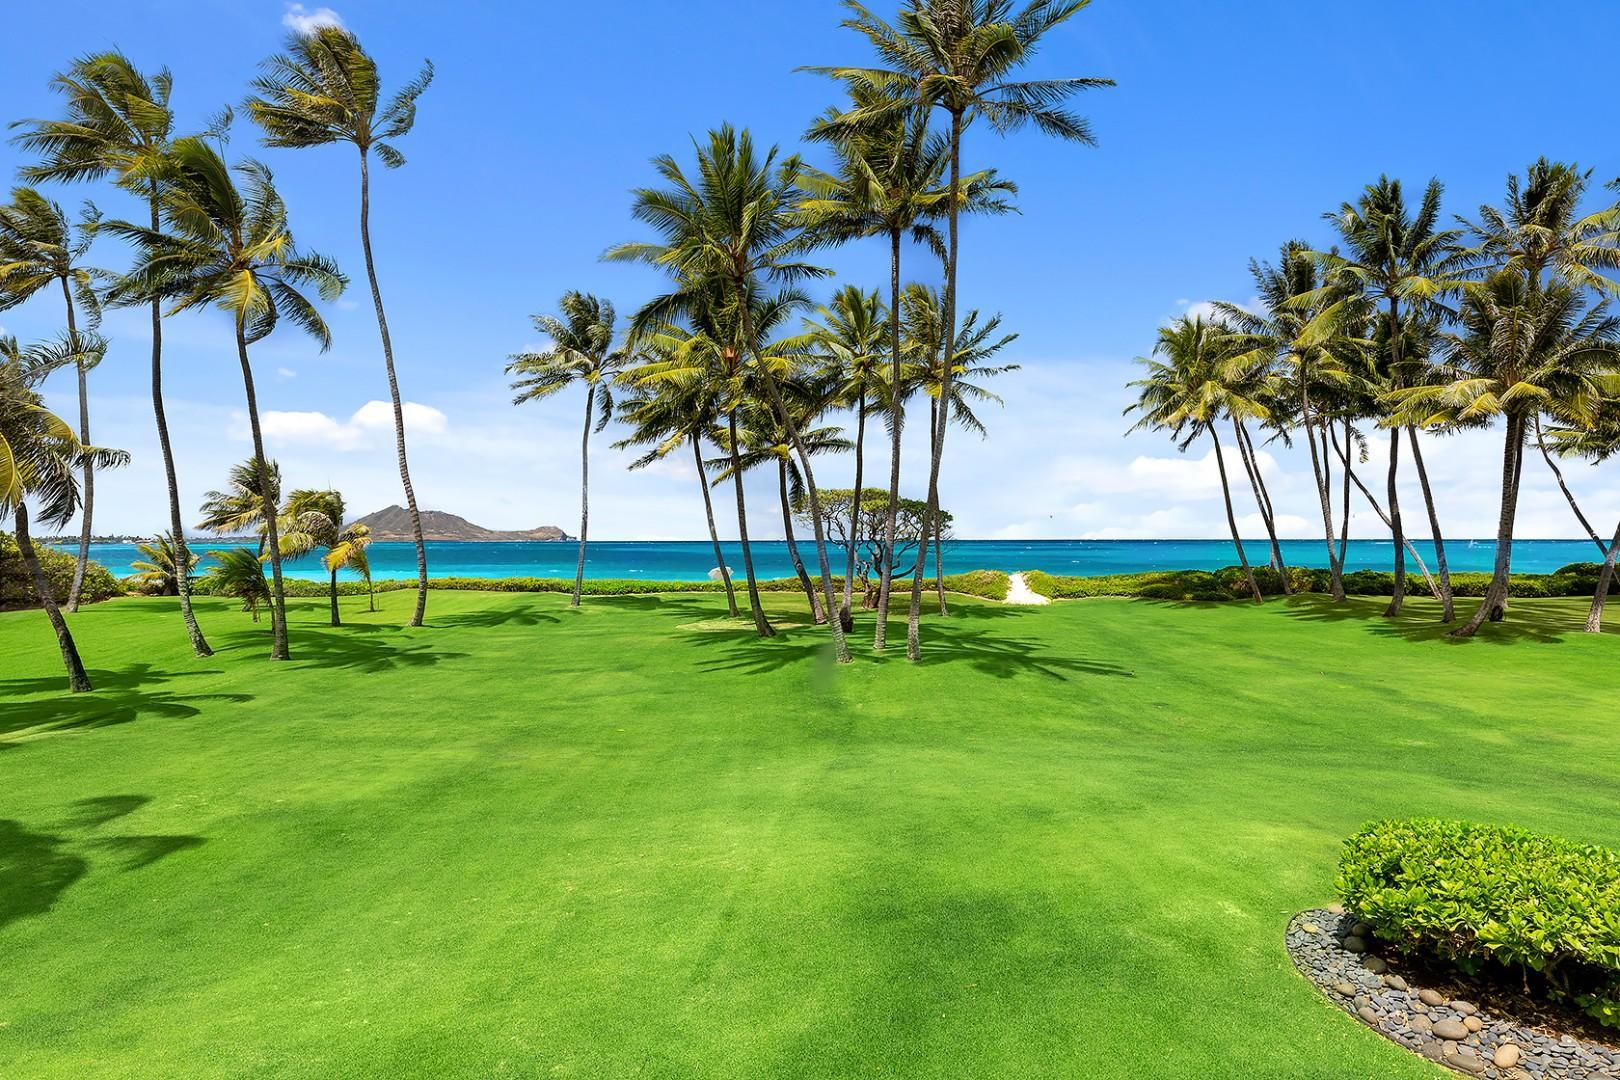 Manicured Tropical Beach Lawn